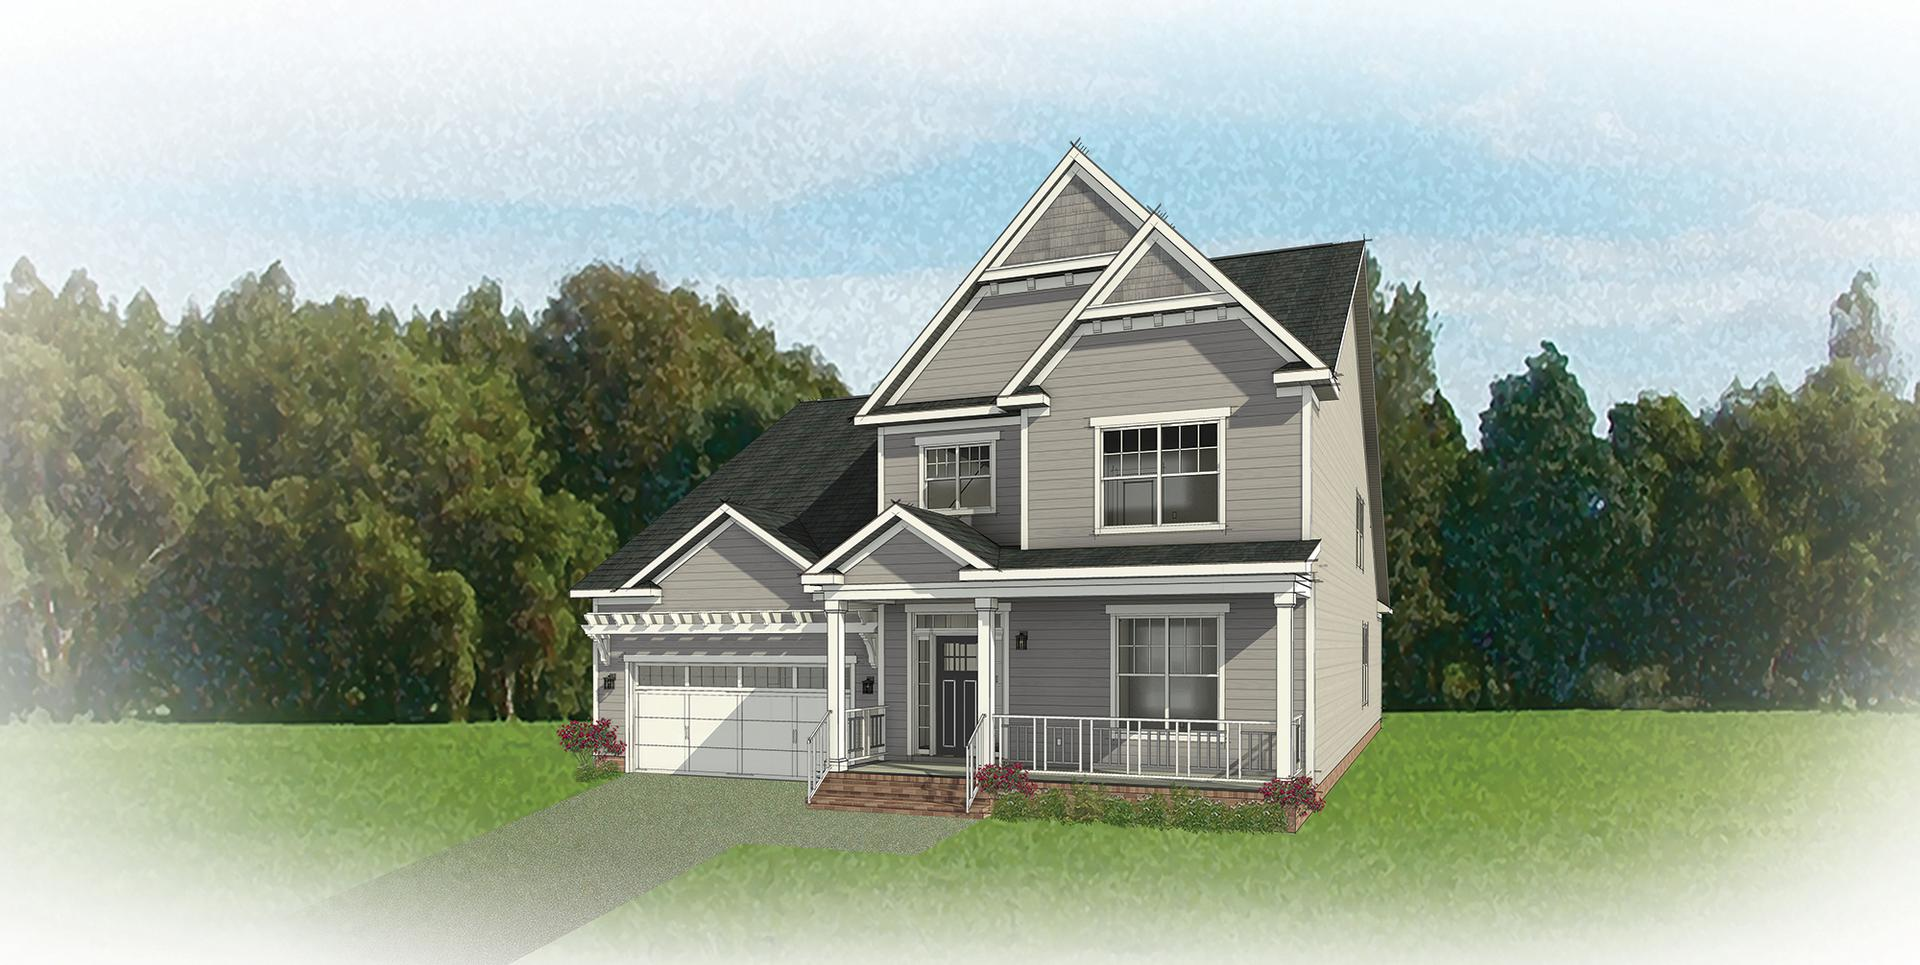 The Linden III new home in Ashland VA